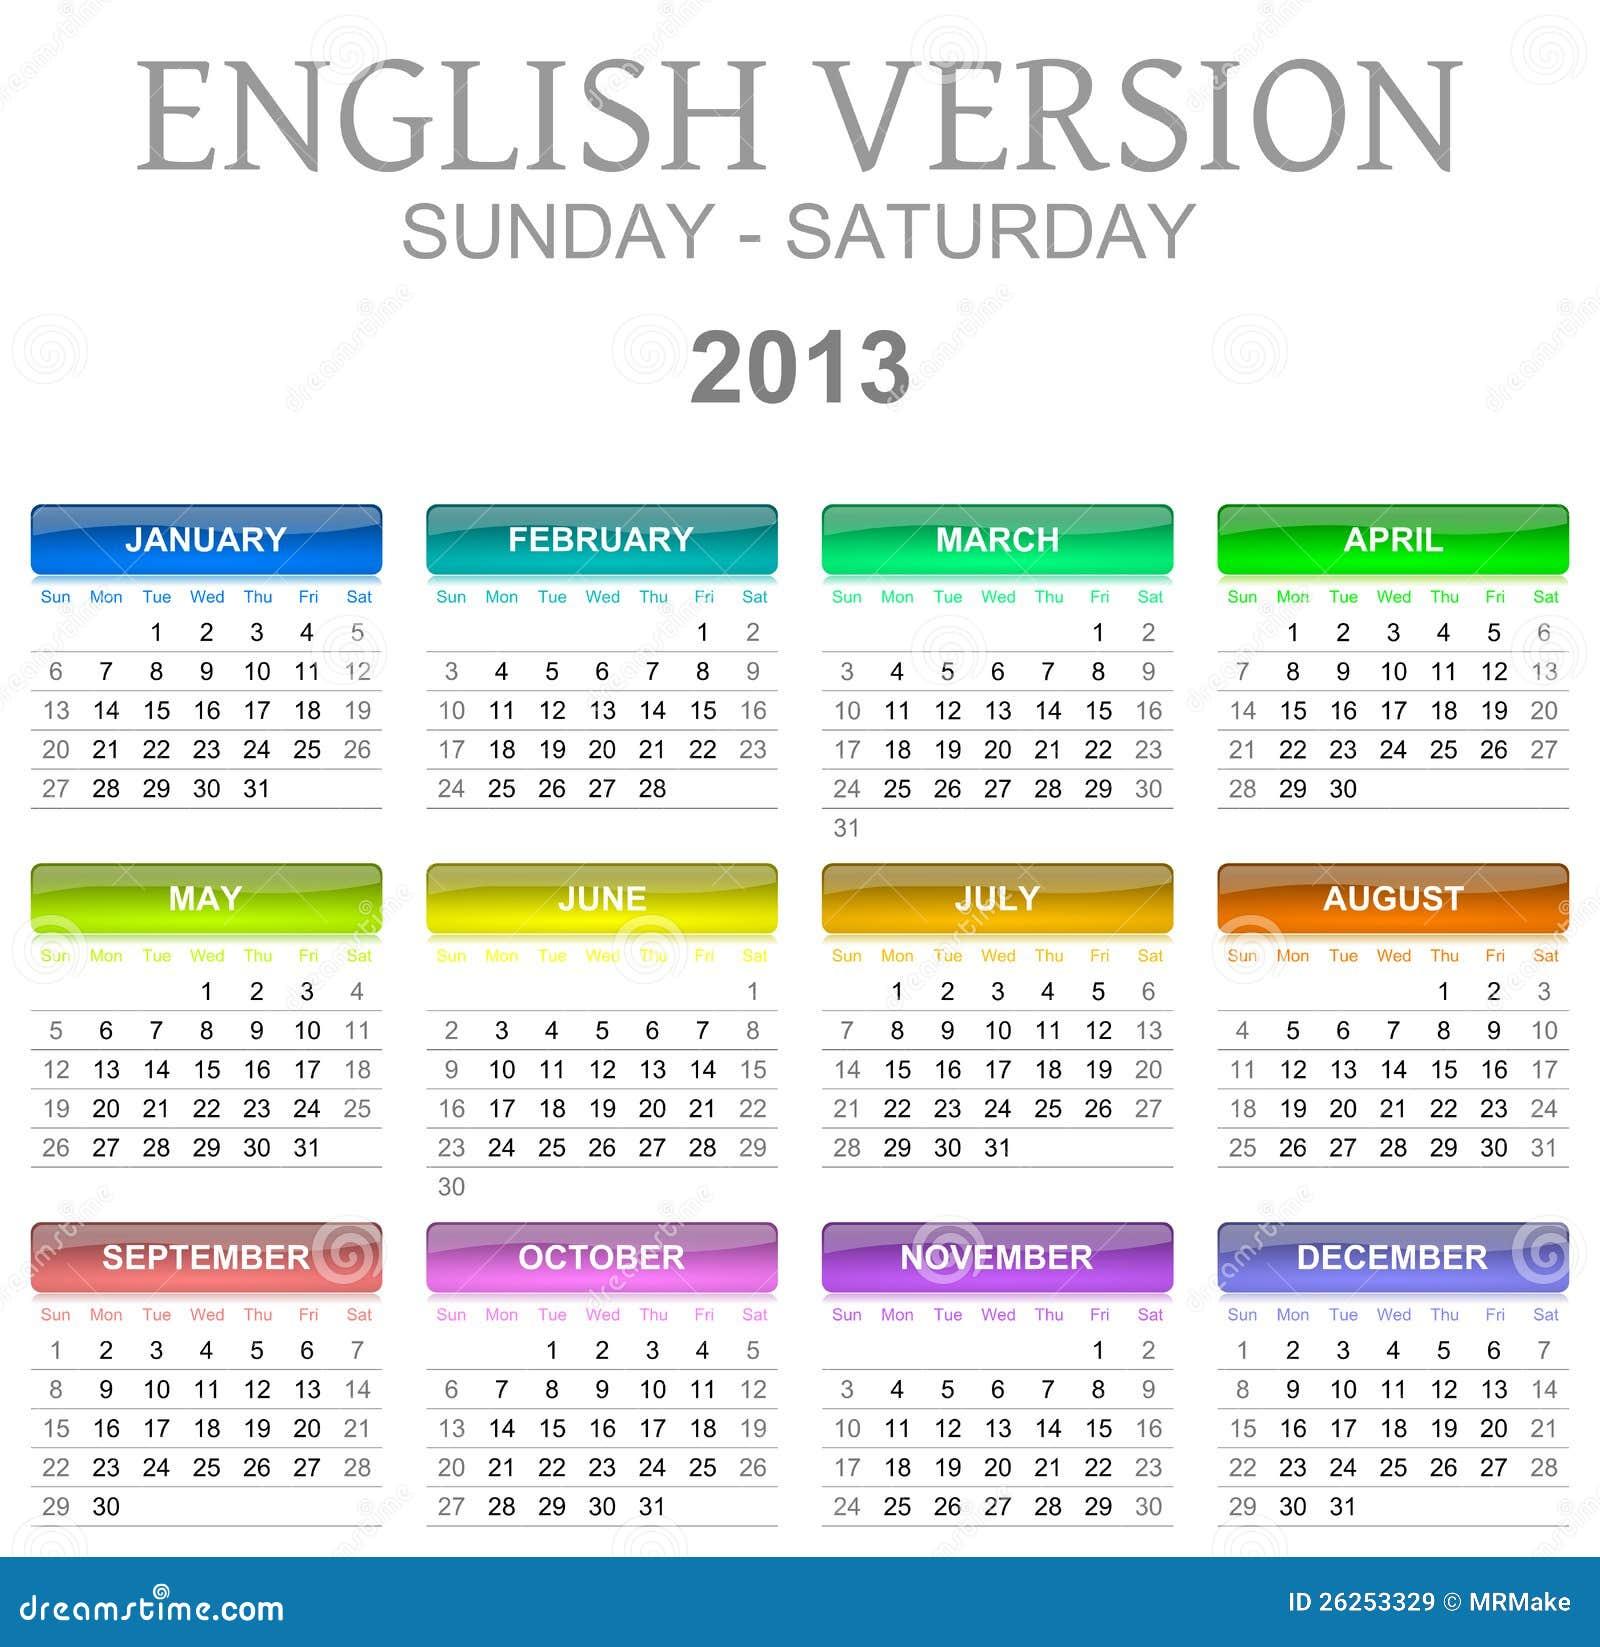 2013 calendar english version sun - sat